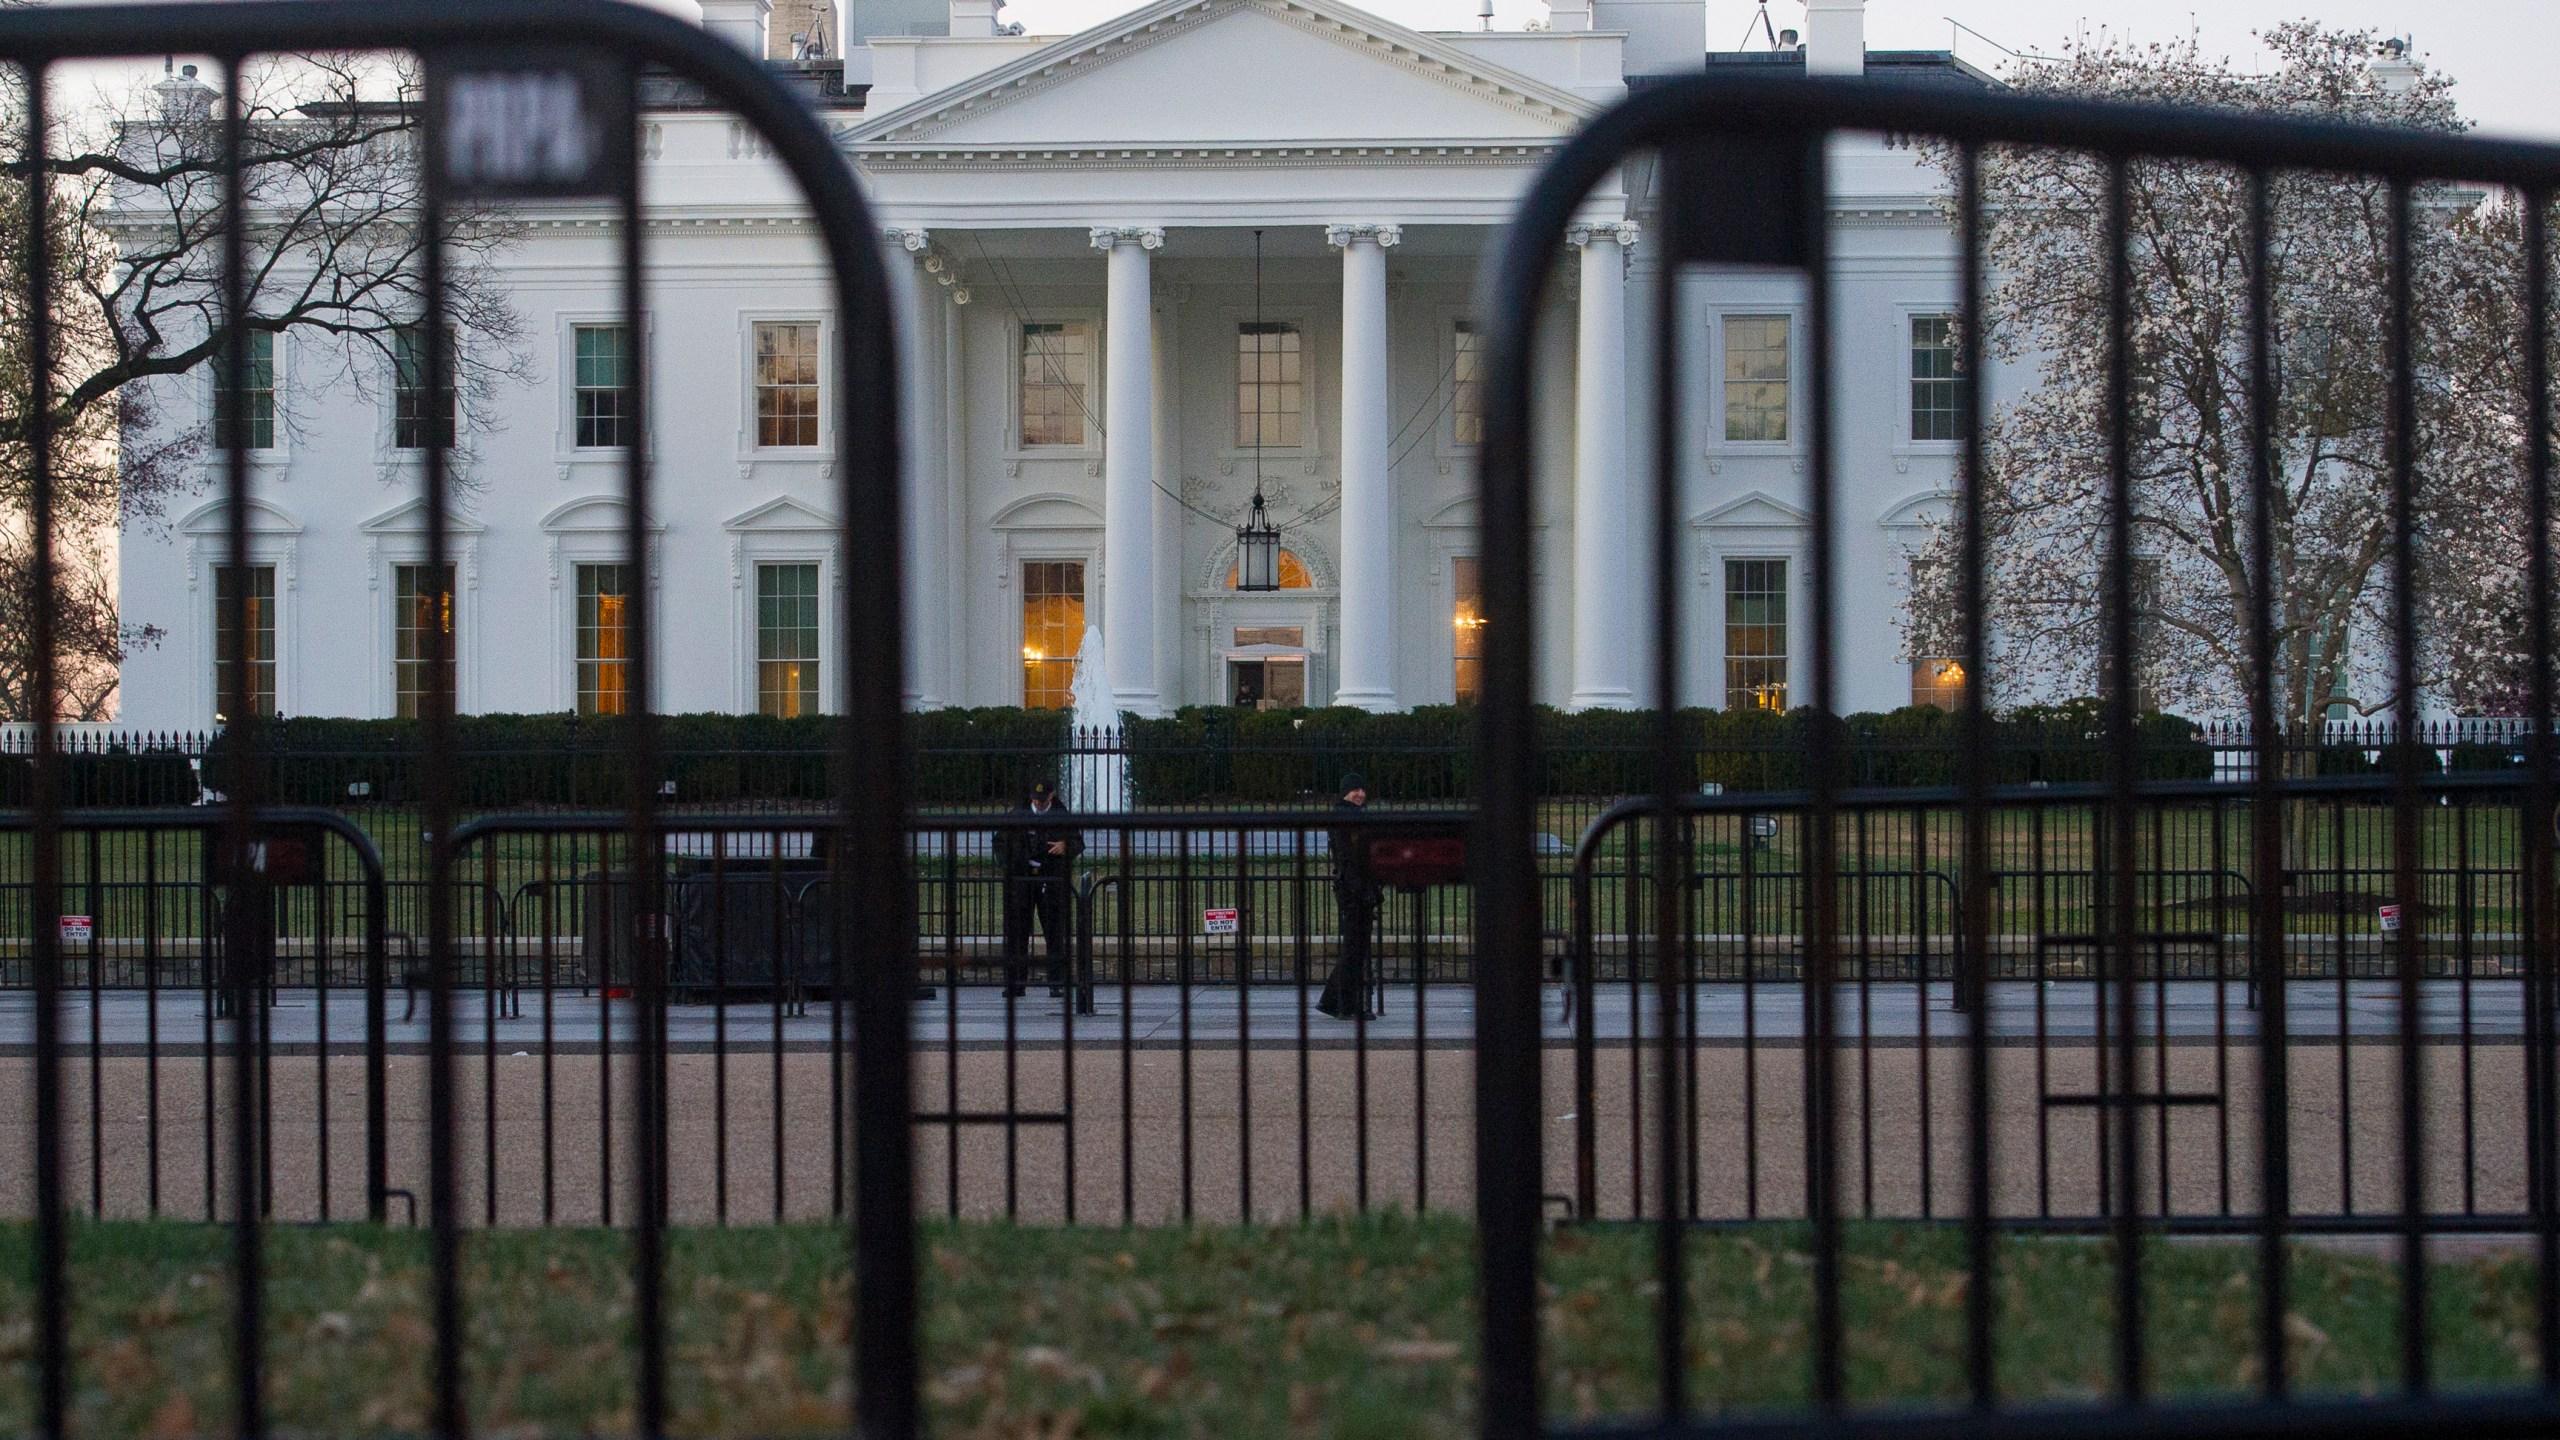 White_House_Security_Clearances_19506-159532.jpg60711769